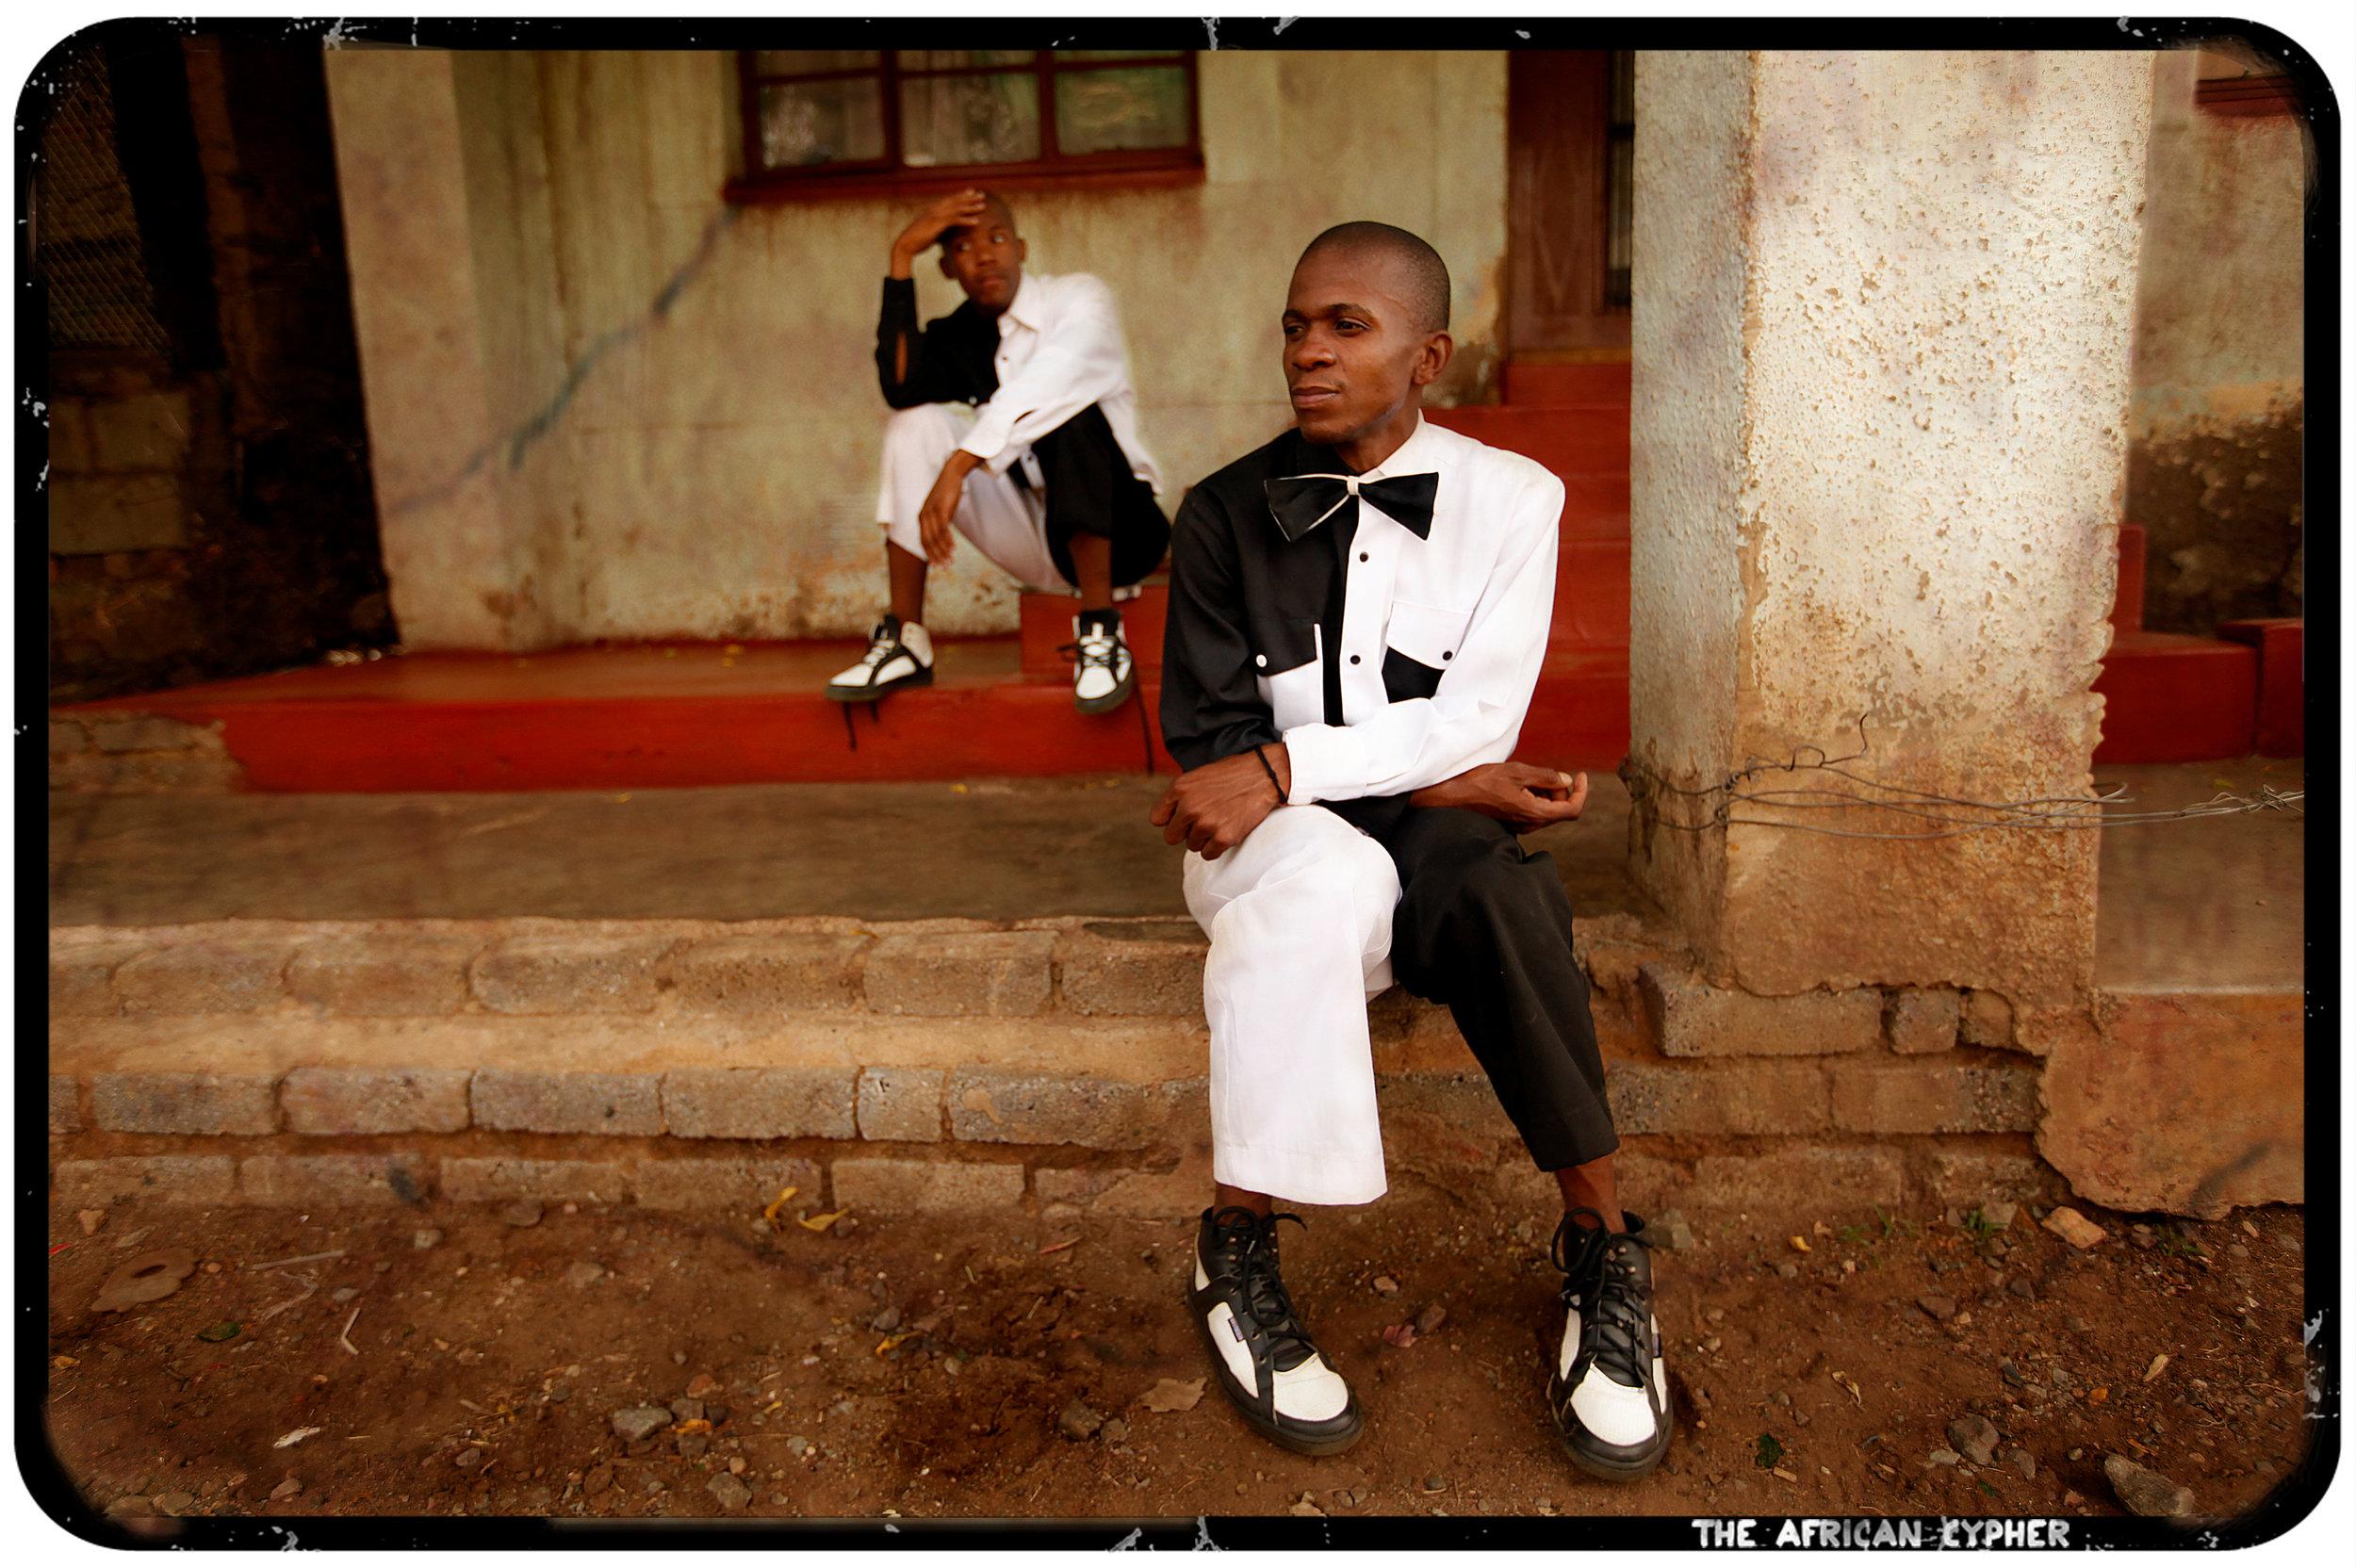 stillS:  The African Cypher  (Bryan Little, South Africa 2012)